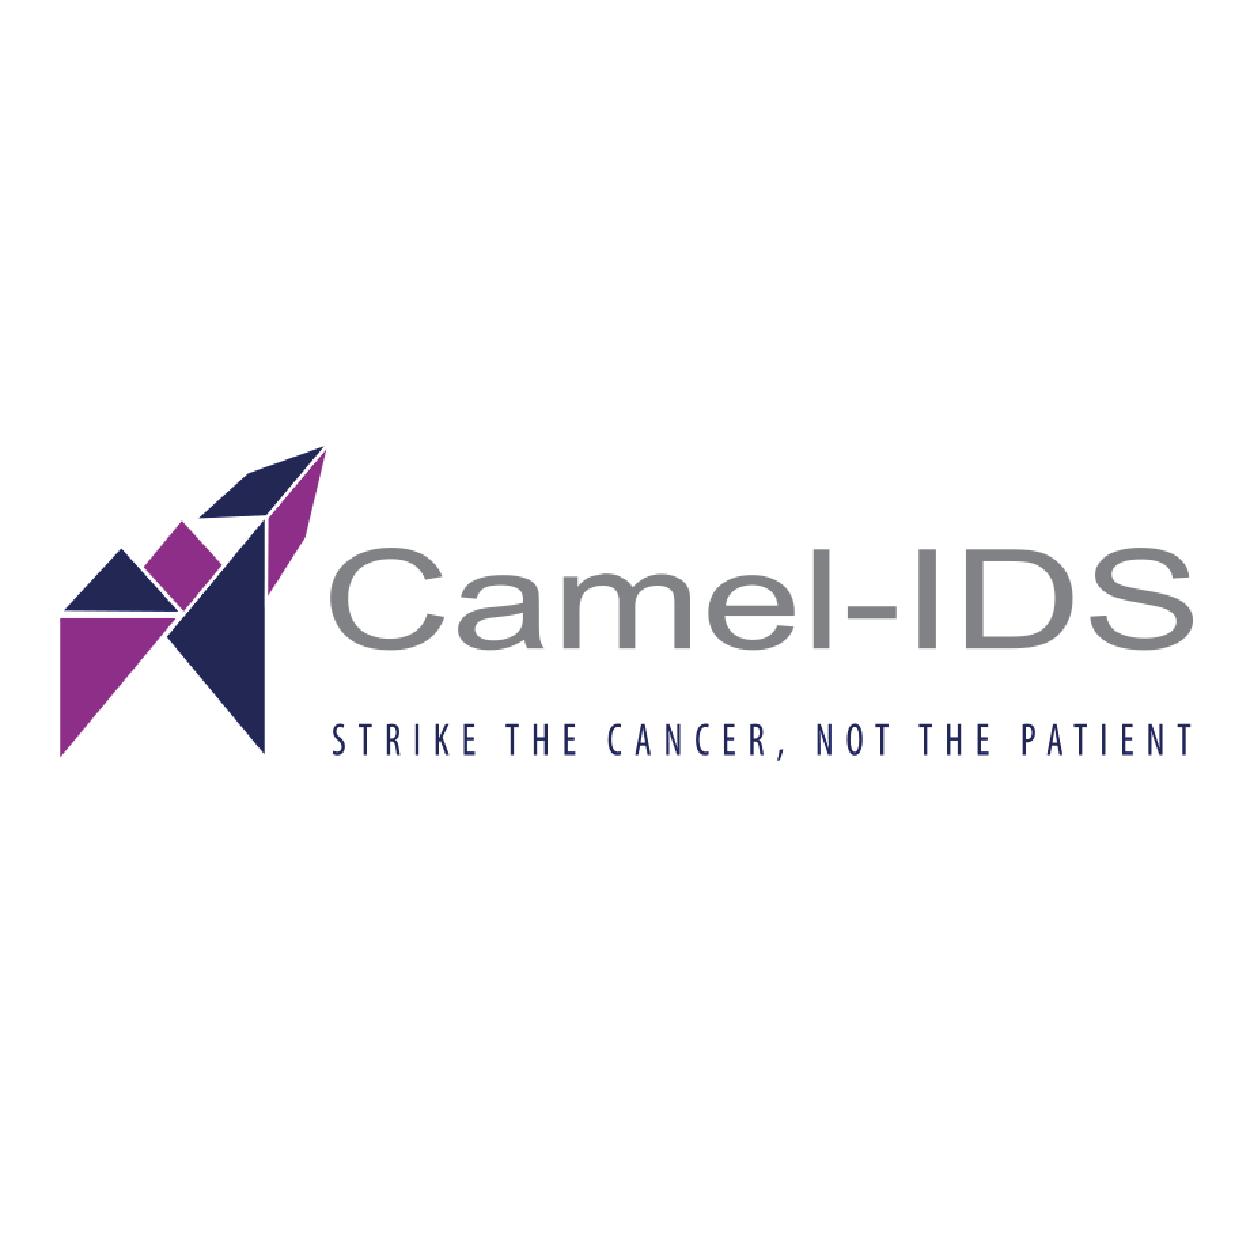 CAMLE-IDS